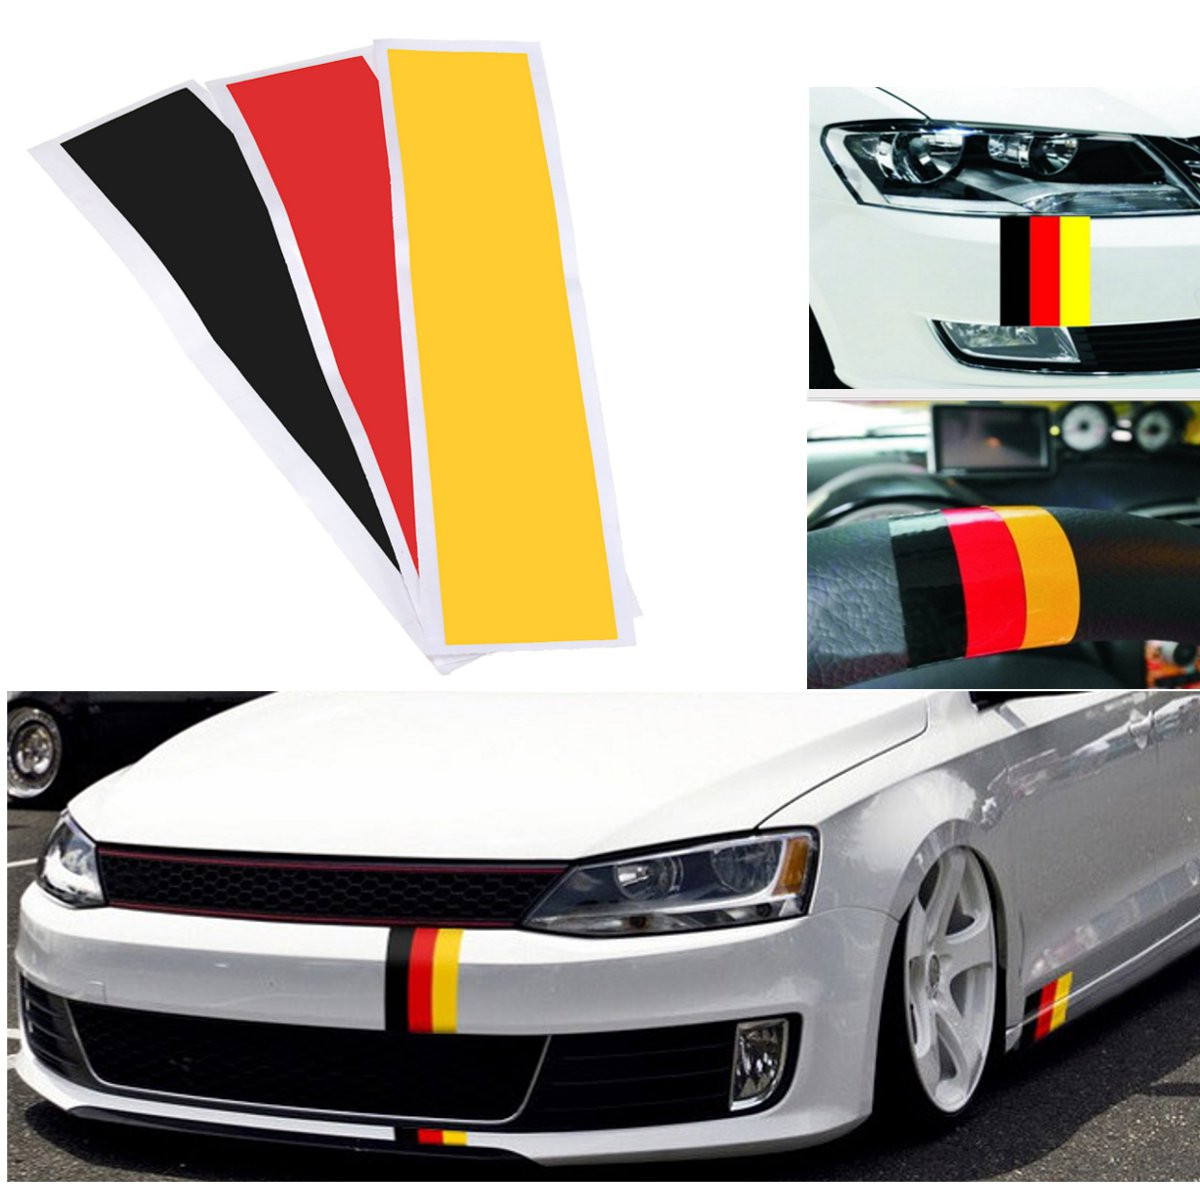 Набор наклеек с немецким флагом, цветная полоса, наклейка для Audi /BMW /Mercedes /VW